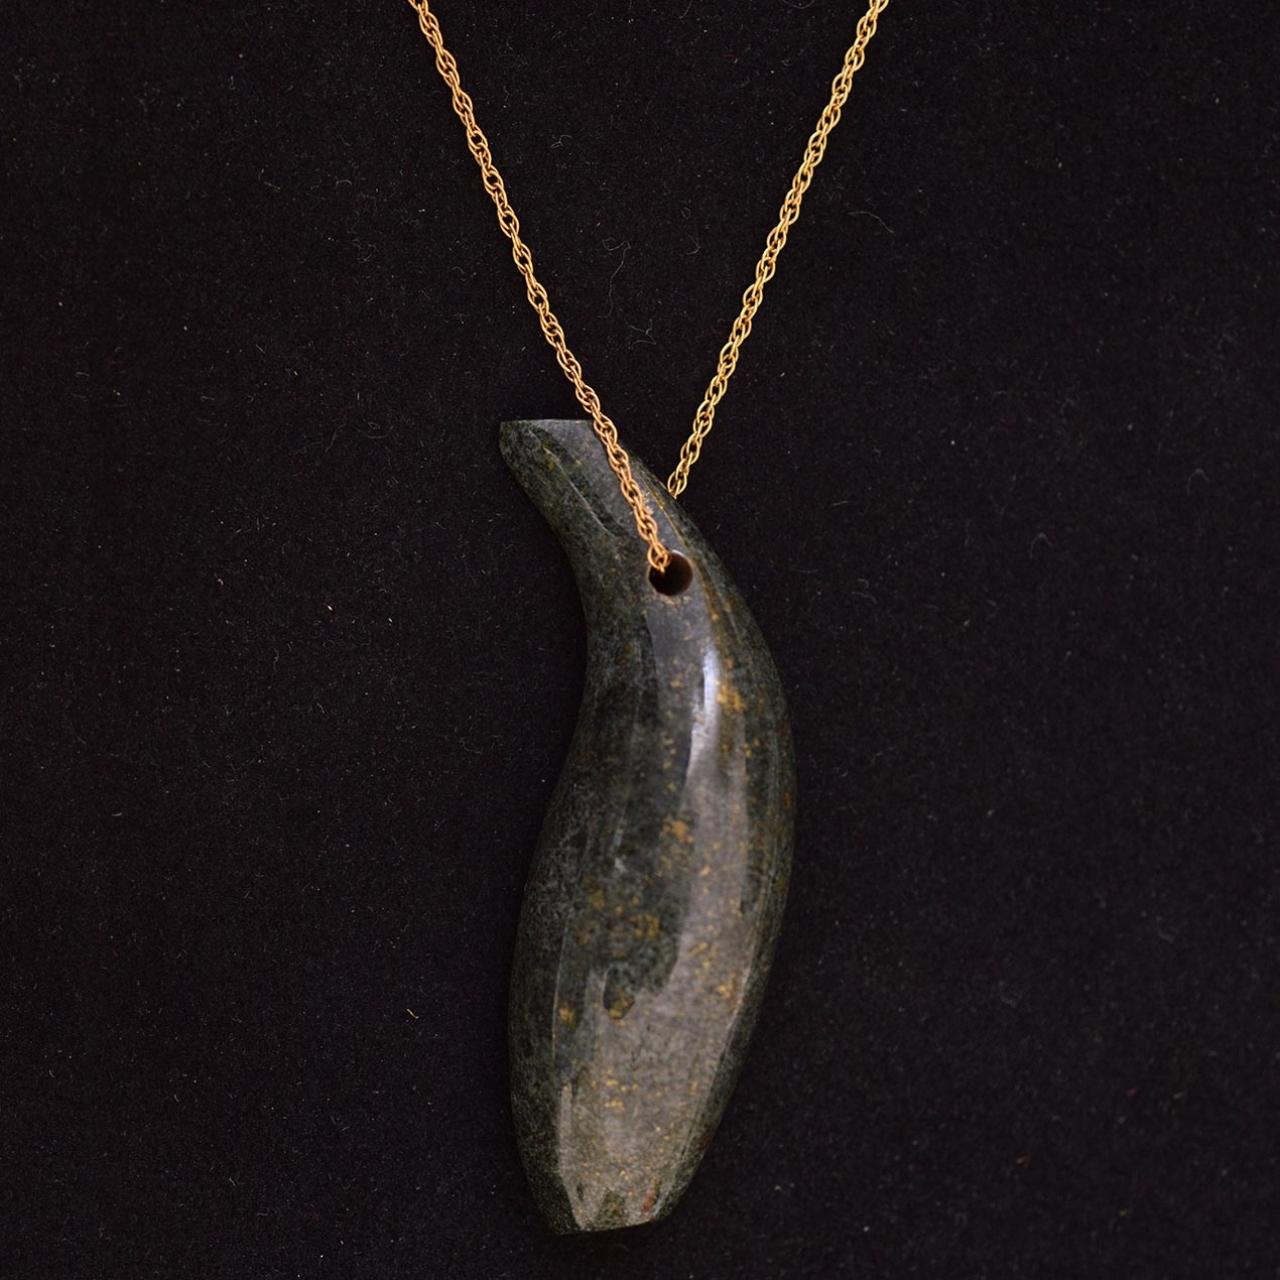 Jade fish necklace tiffany pouchcklace length 44 cm rocks and jade fish necklace tiffany co frank gehry aloadofball Choice Image